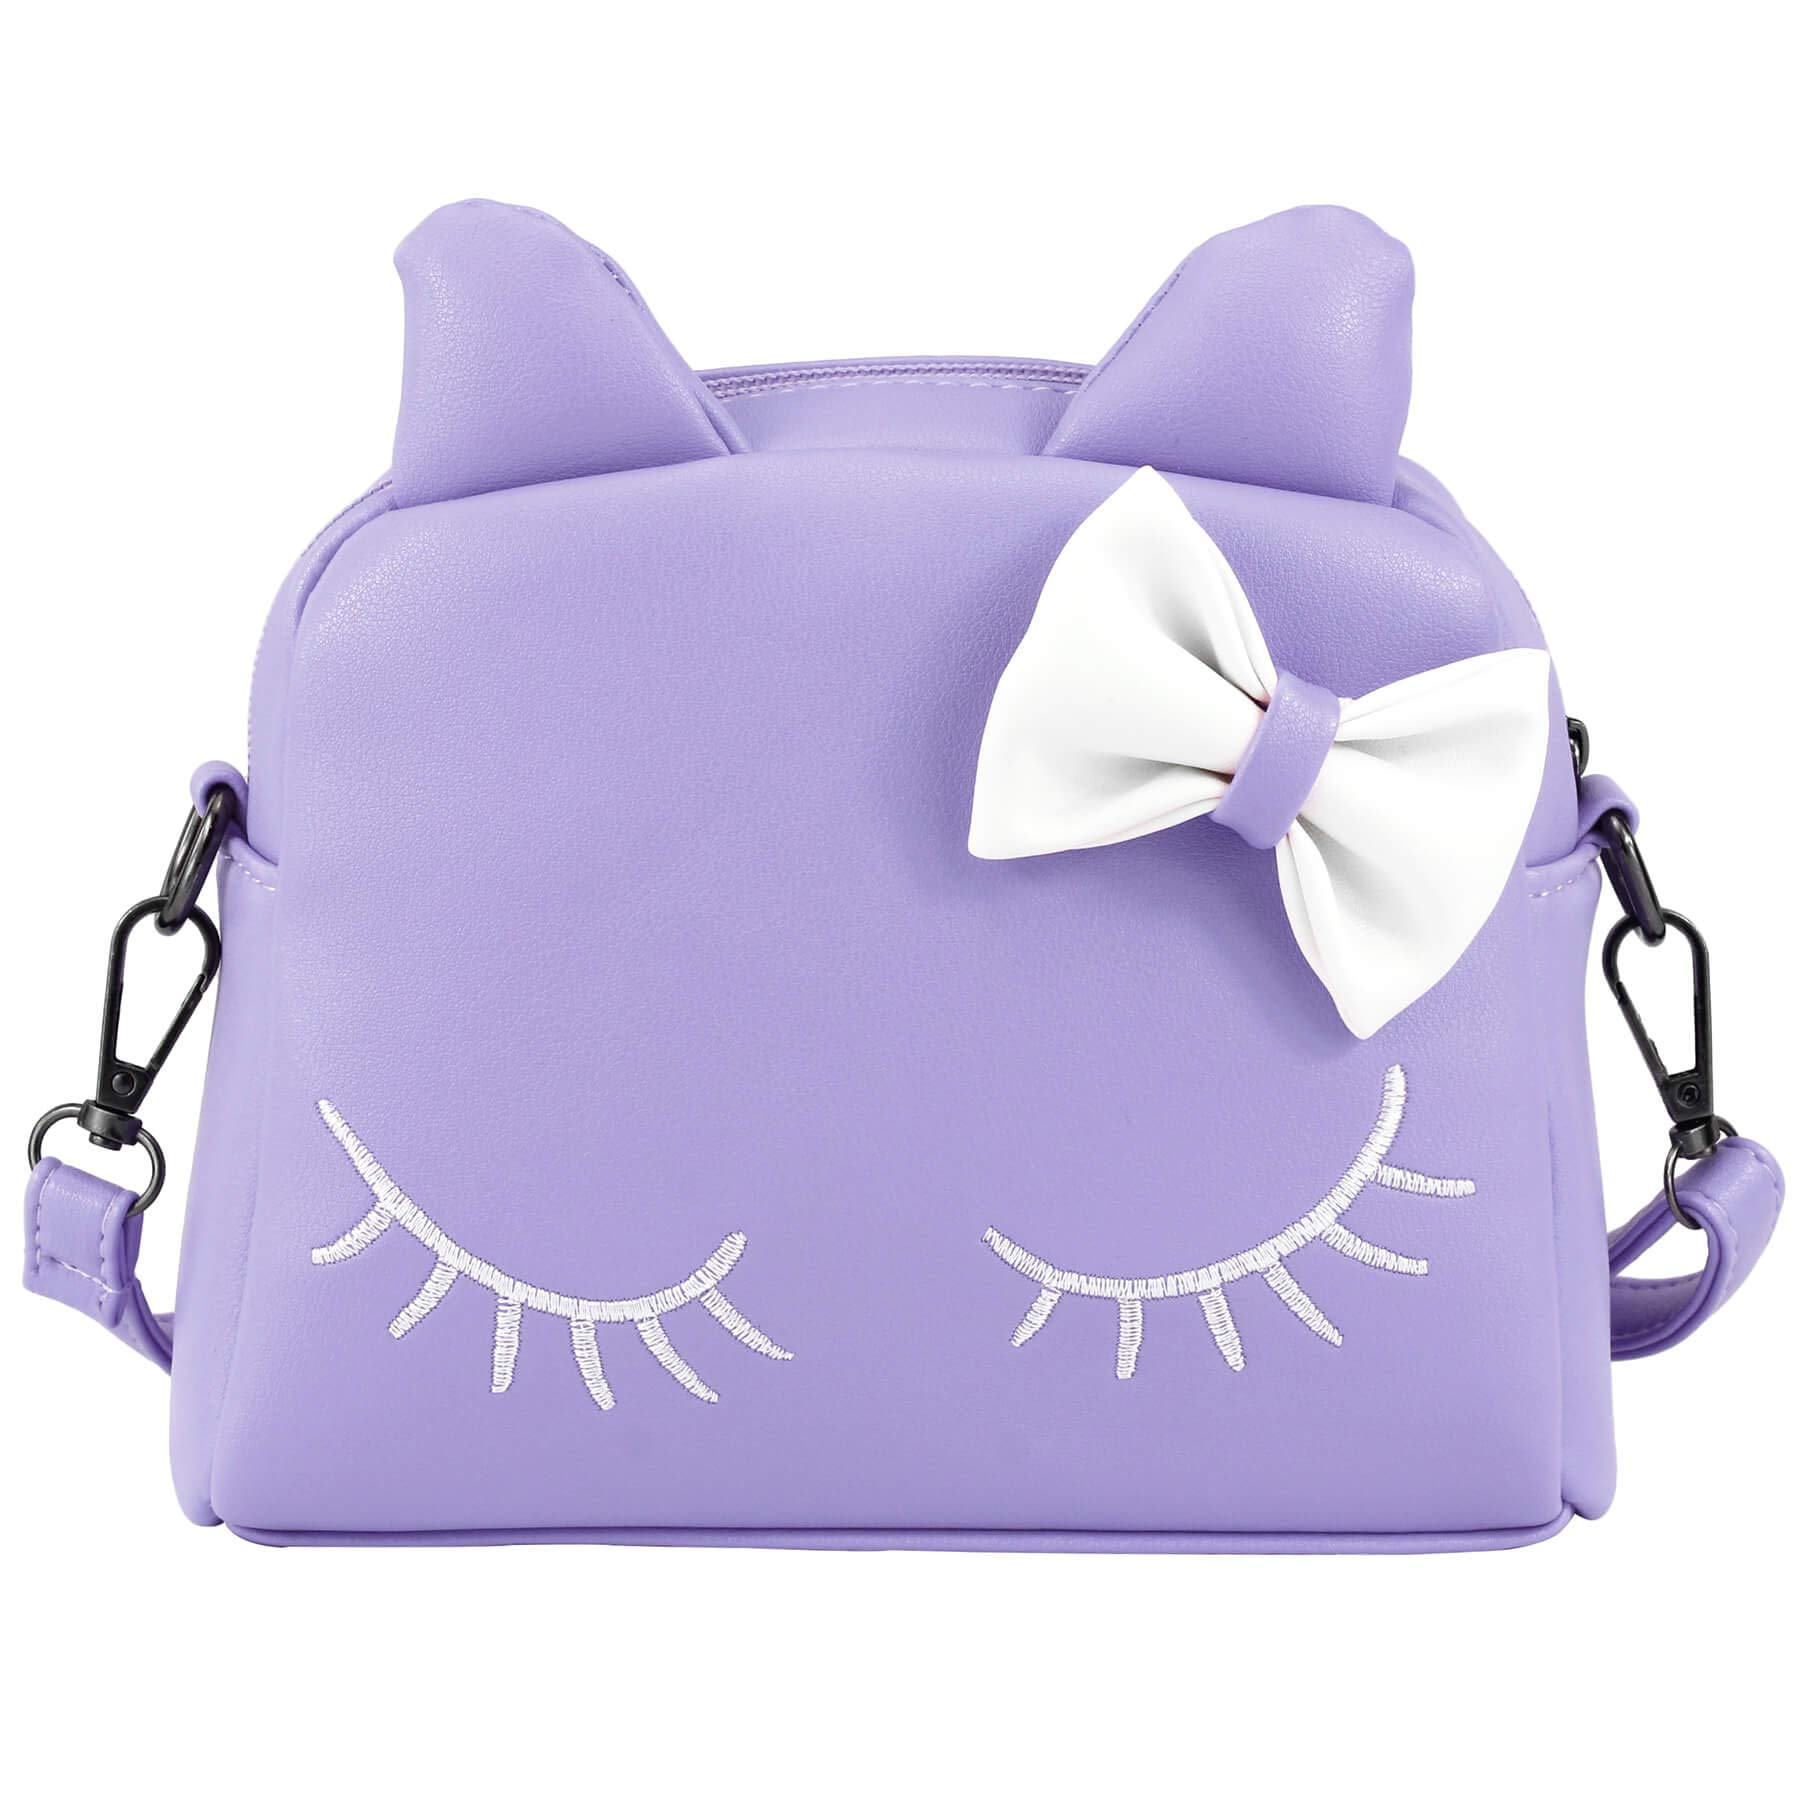 Kids Purses Girls Cat Purse for Toddler Kids Crossbody Bags